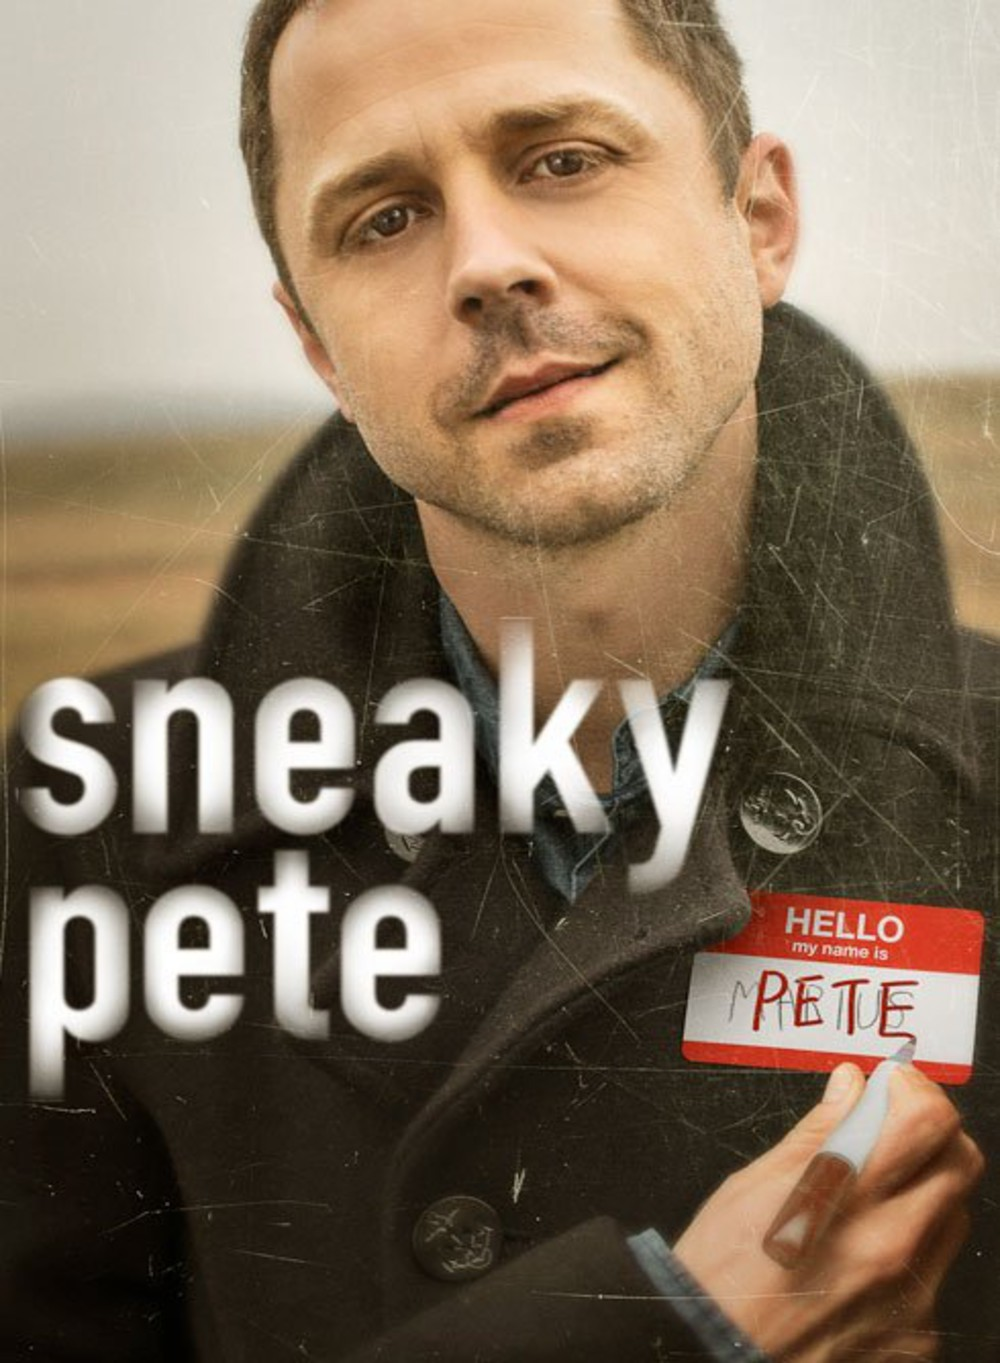 Sneaky Pete - Season 1 (Fuse FX)